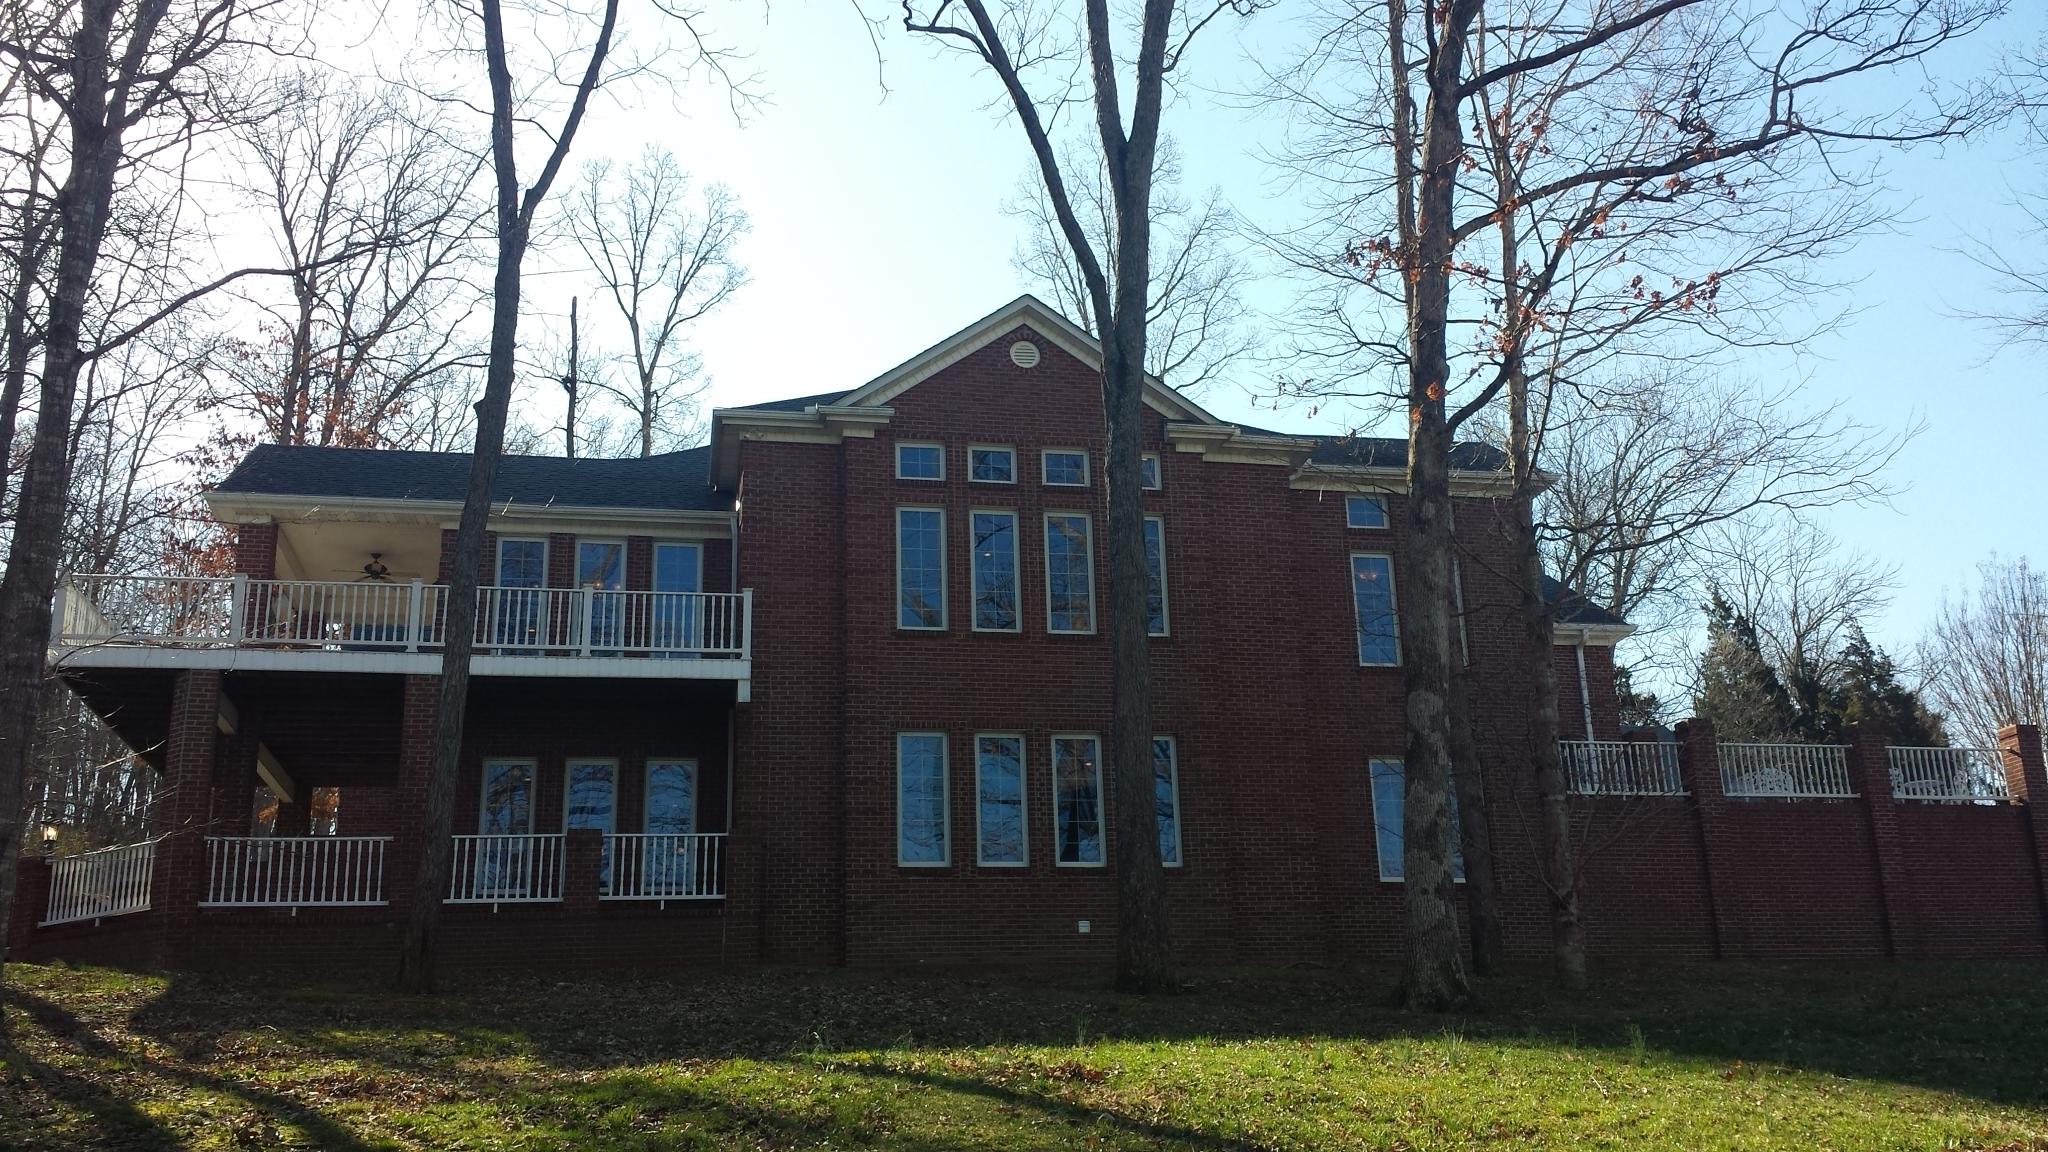 259 Halcomb Dr, Somerset, Kentucky 42501